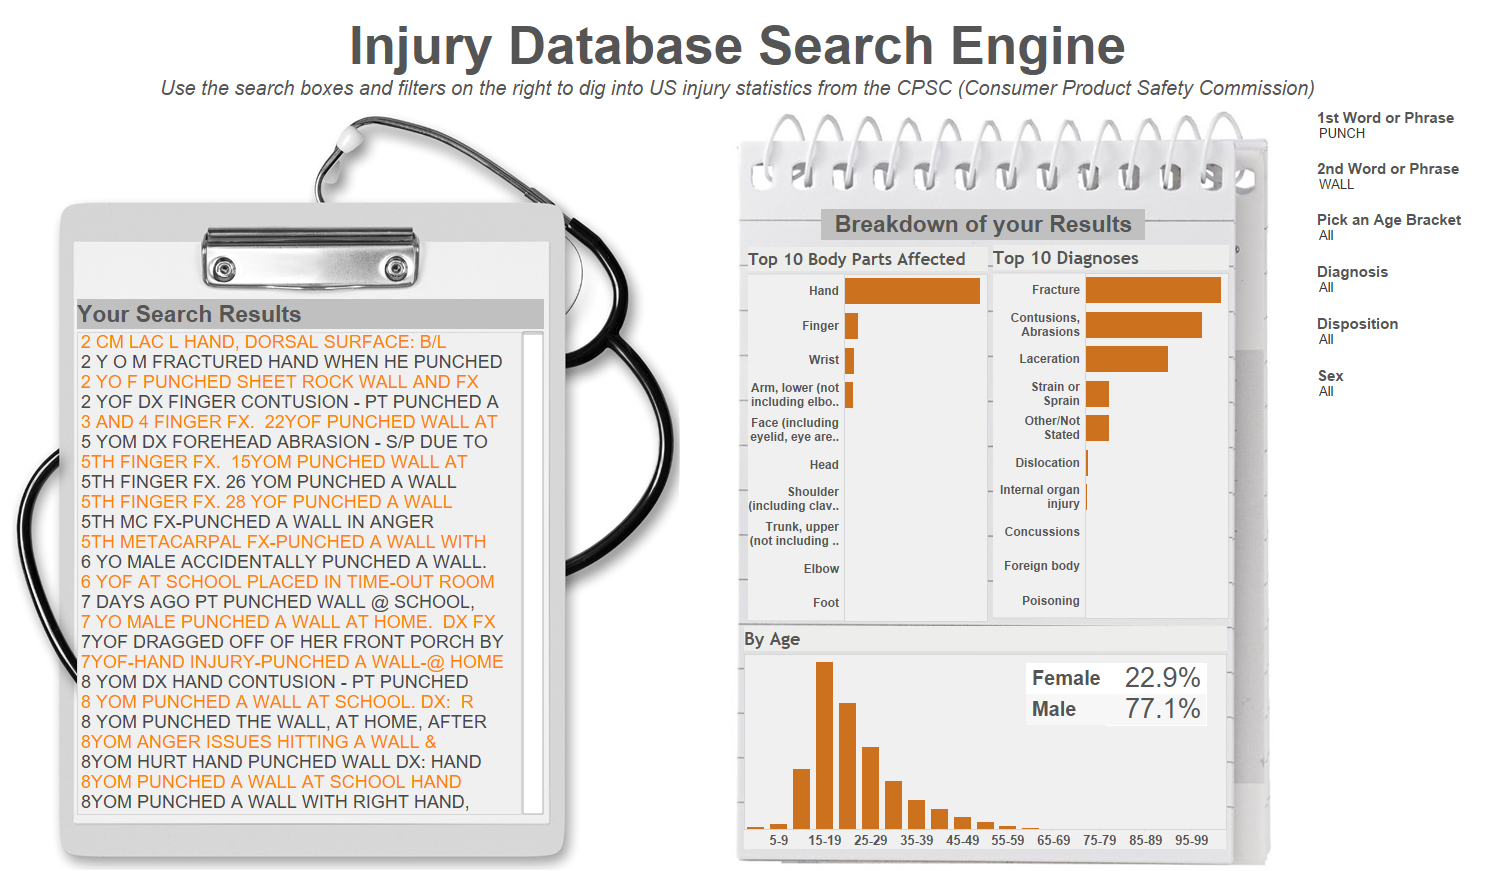 Injury Database Search Engine